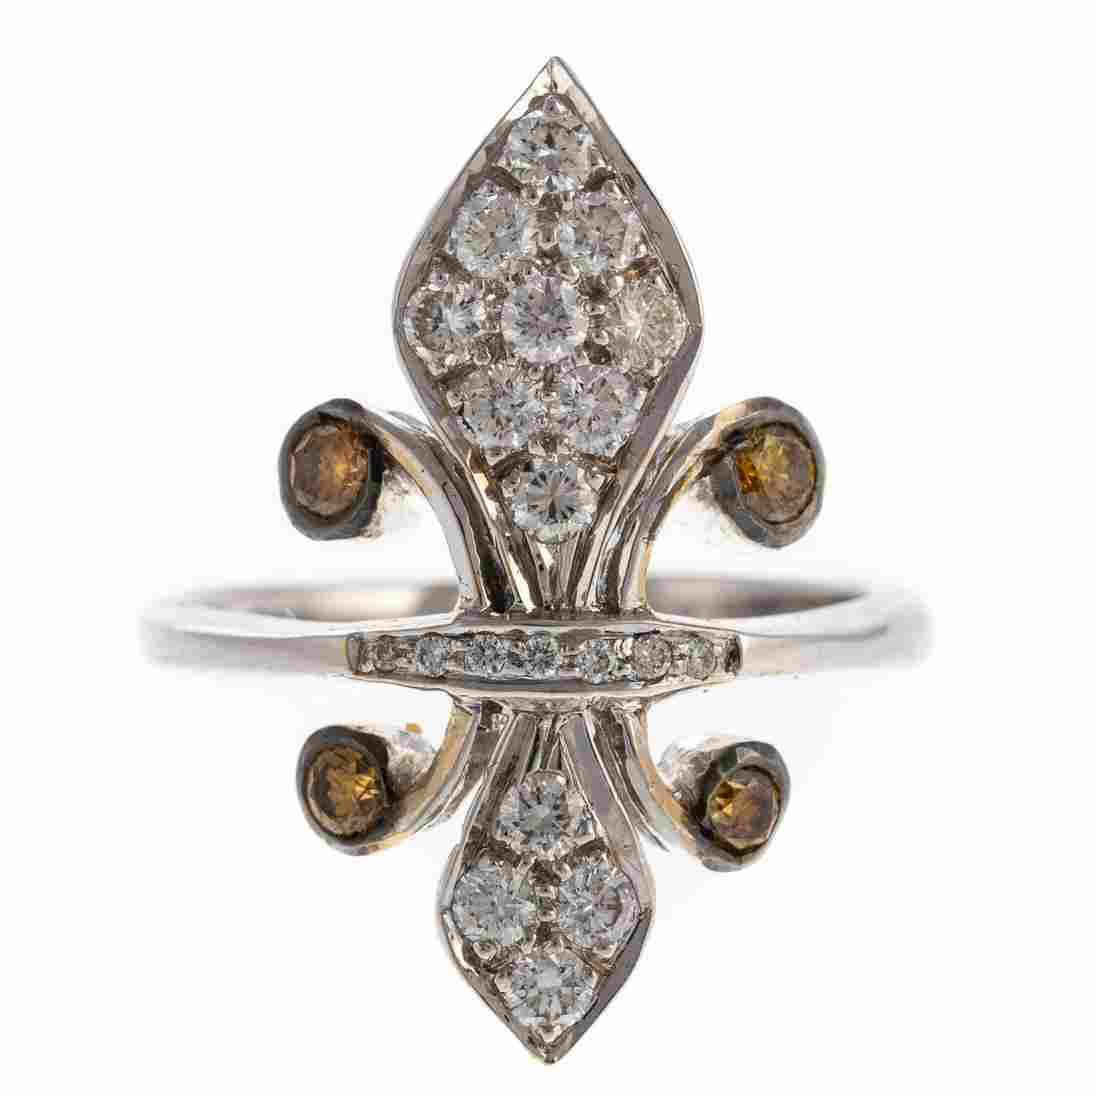 A Ladies Fleur de Lis Diamond Ring in 18K